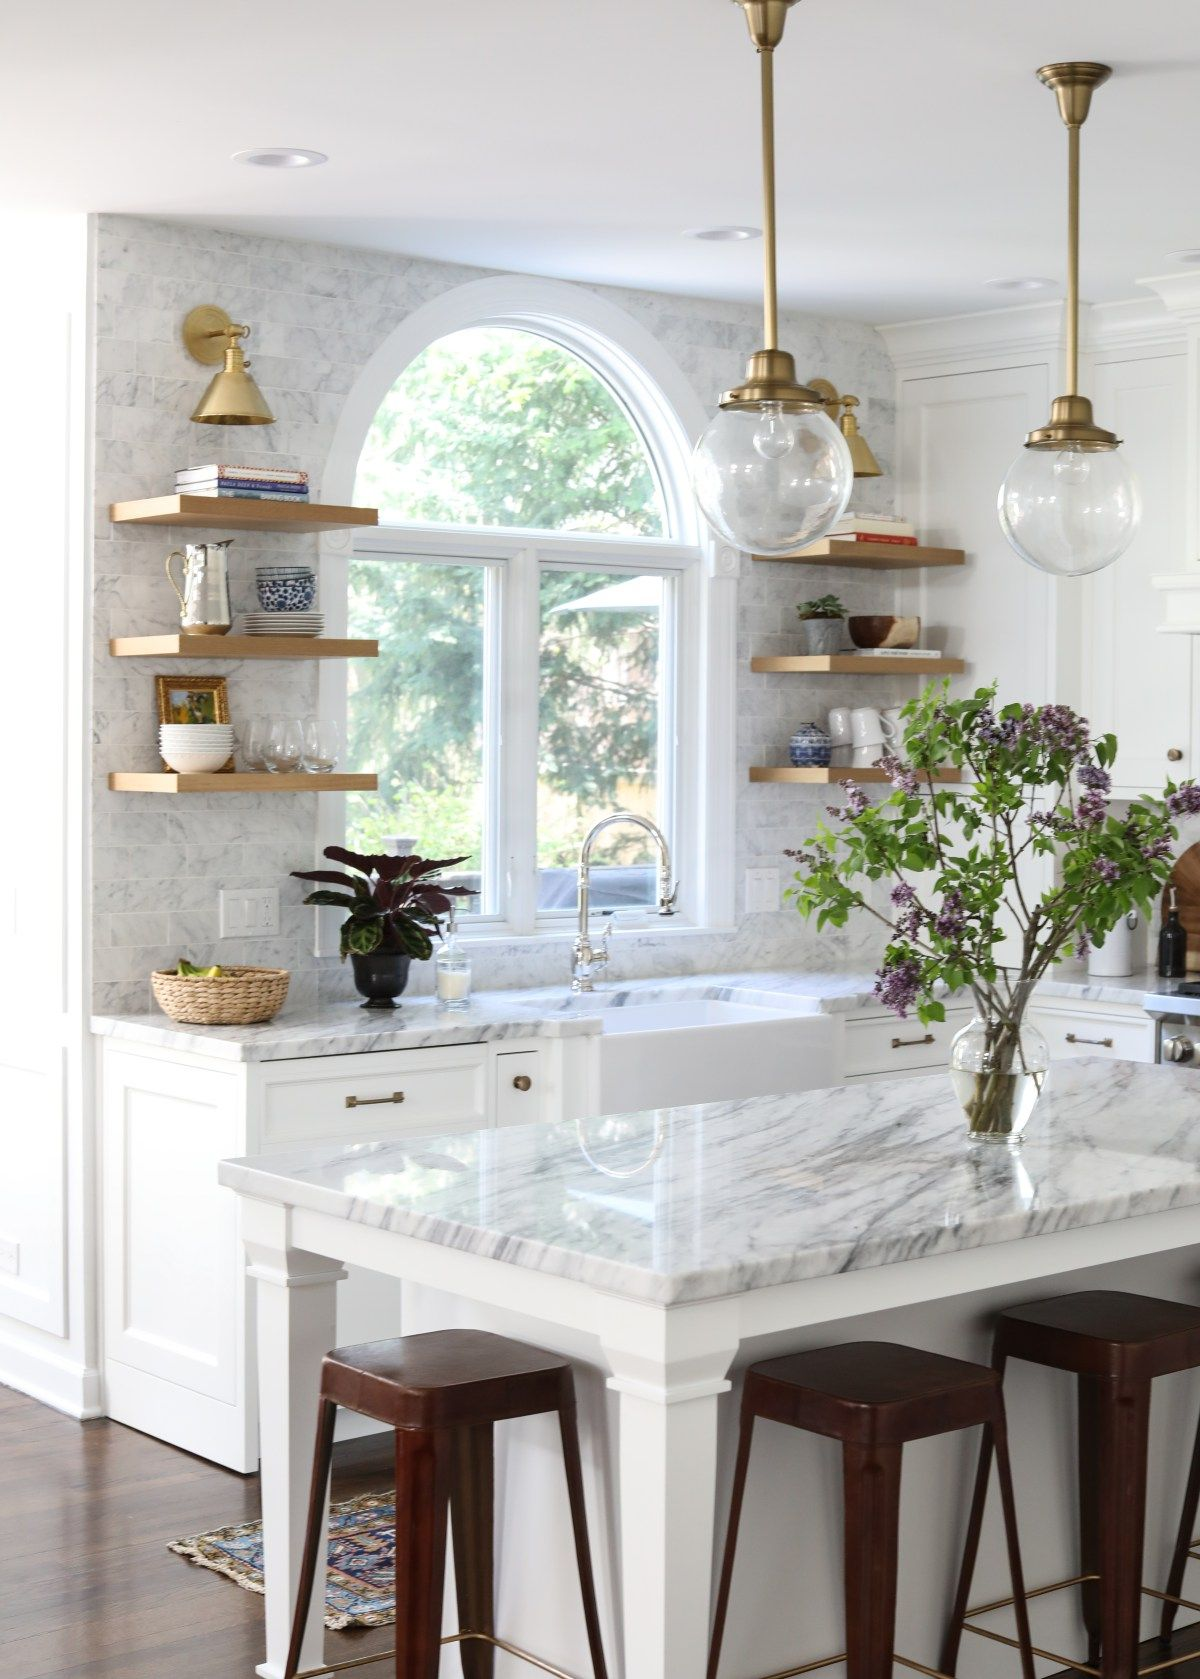 Lorraine kitchen renovation before and after decor kitchen